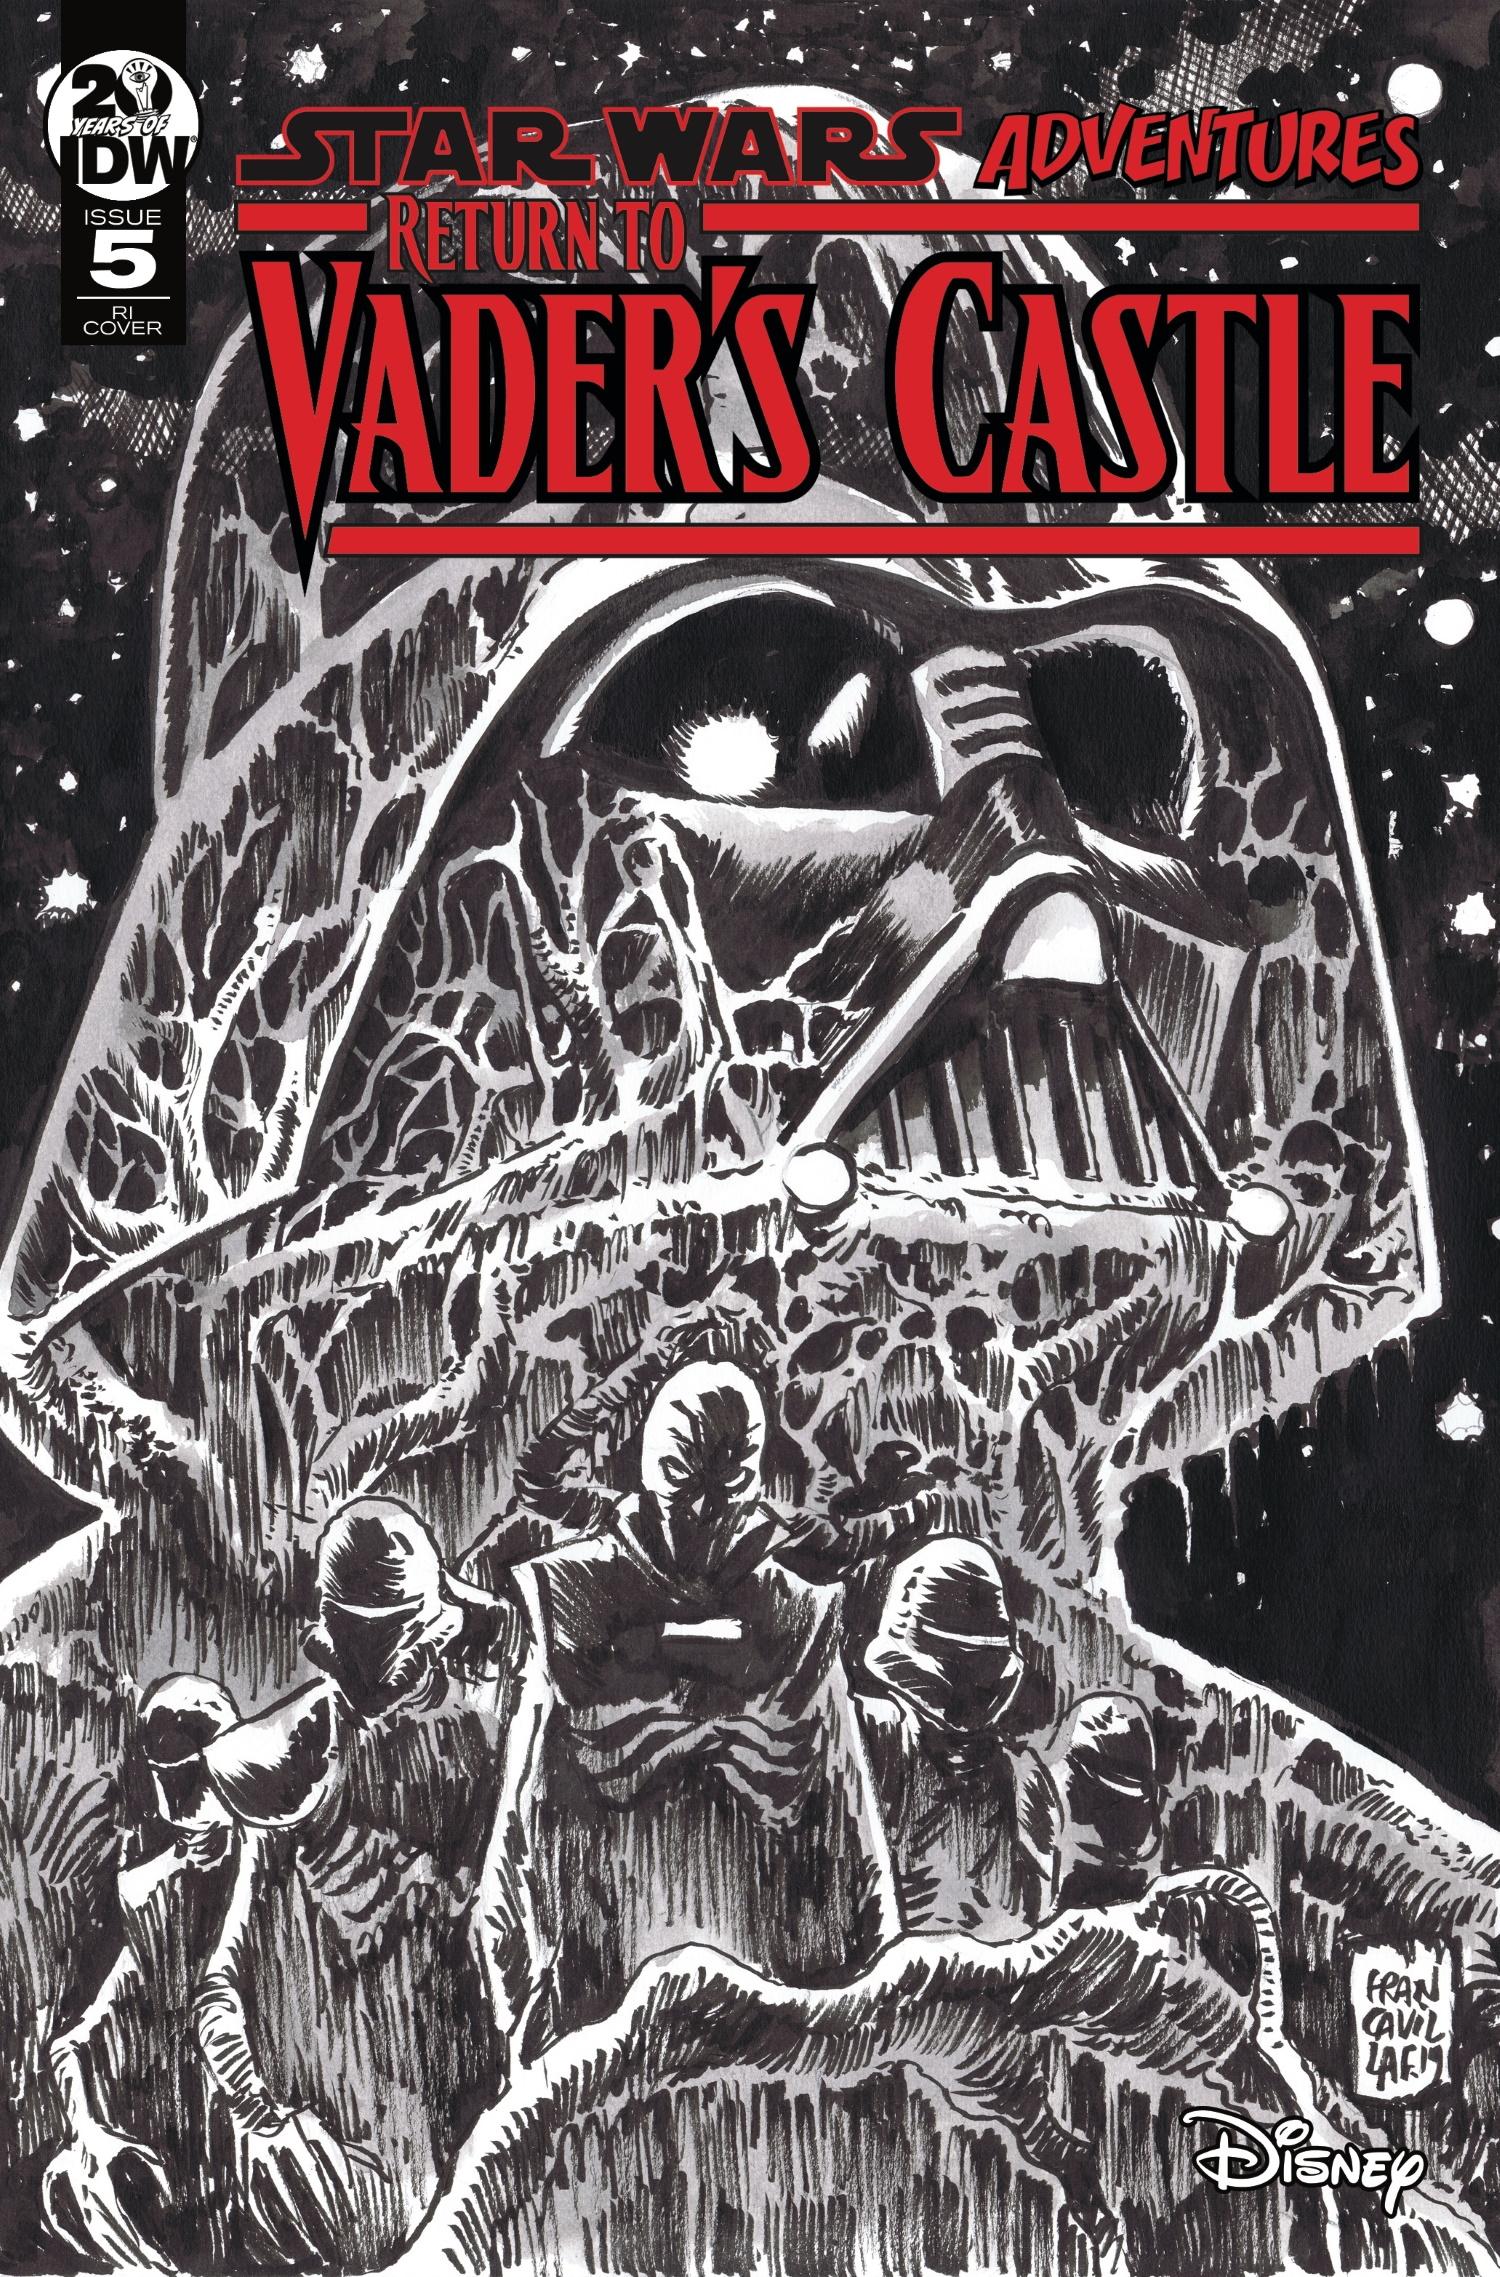 Return to Vader's Castle #5 (Francesco Francavilla Black & White Variant Cover) (30.10.2019)